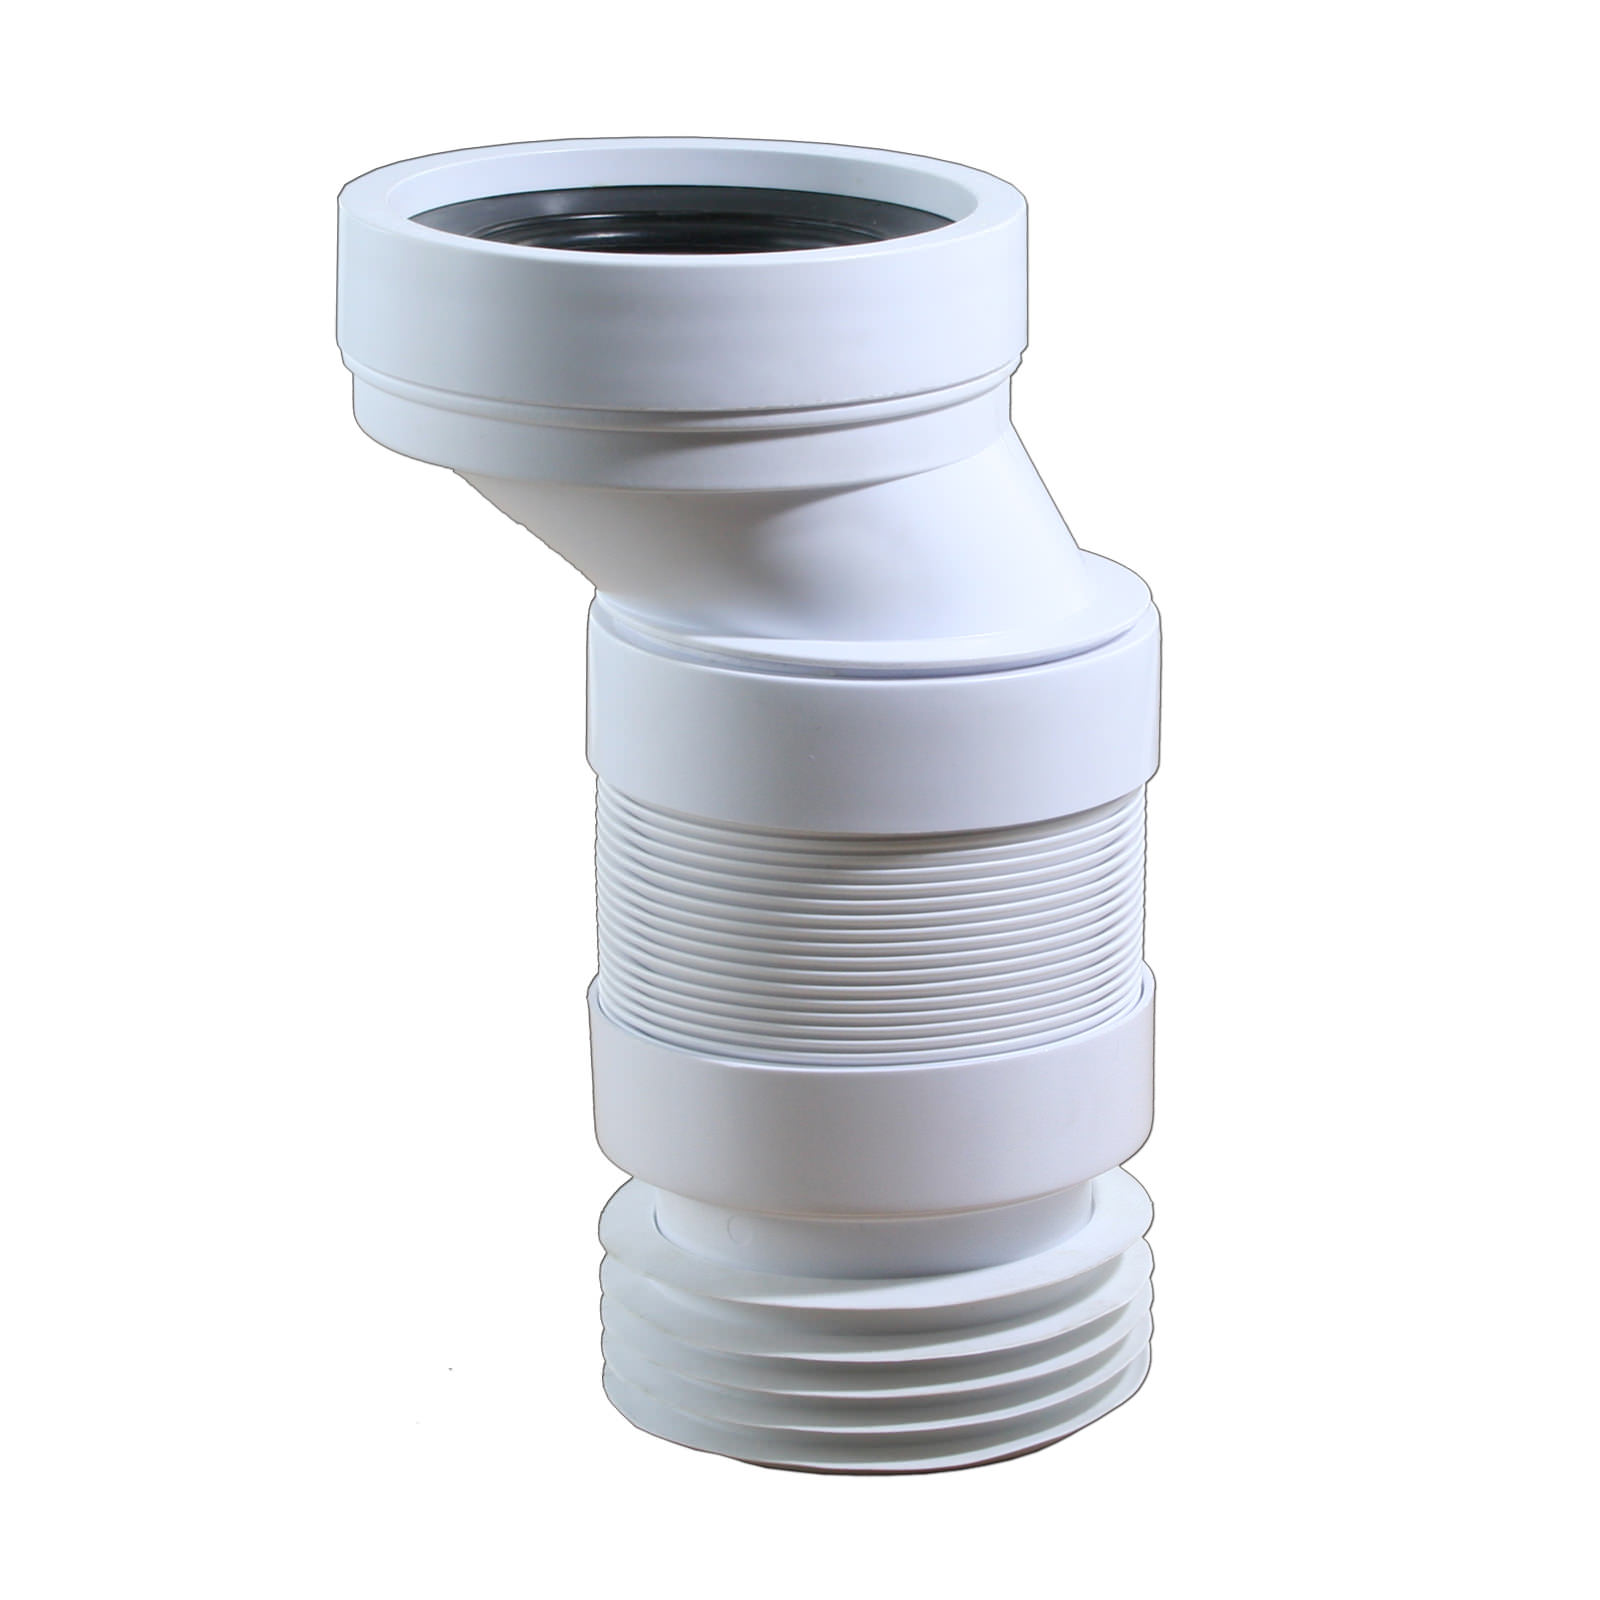 flexible wc anschluss dn 100 4 cm versatz sanitaer. Black Bedroom Furniture Sets. Home Design Ideas